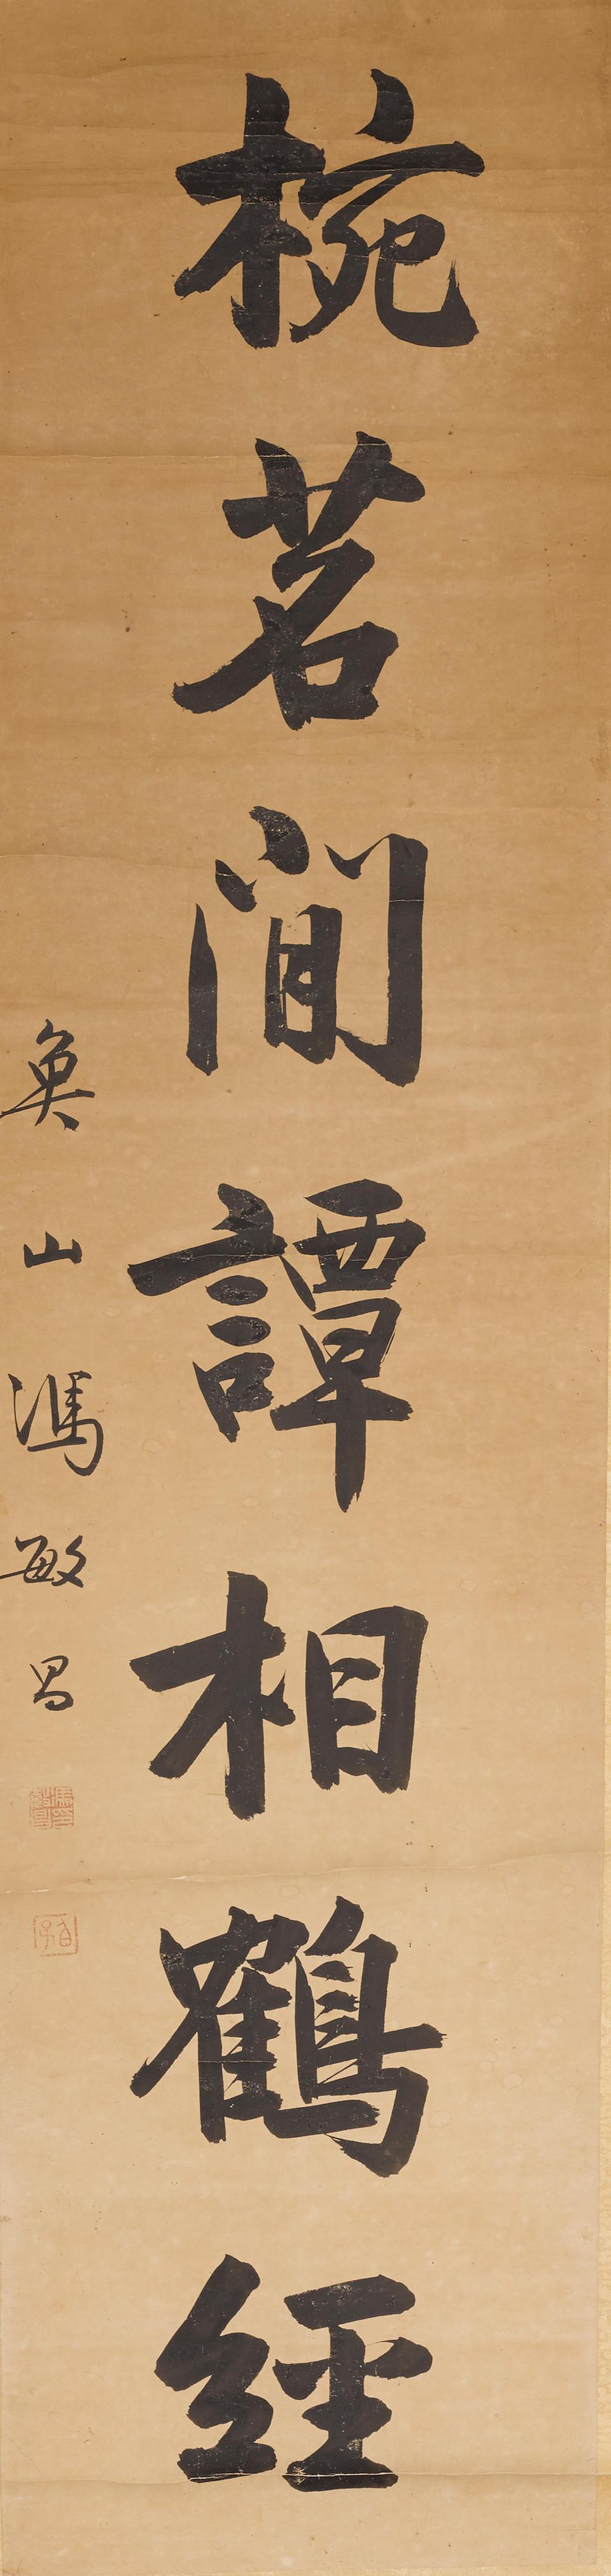 Feng Minchang (1741-1806)  Couplet of Calligraphy in Running Script